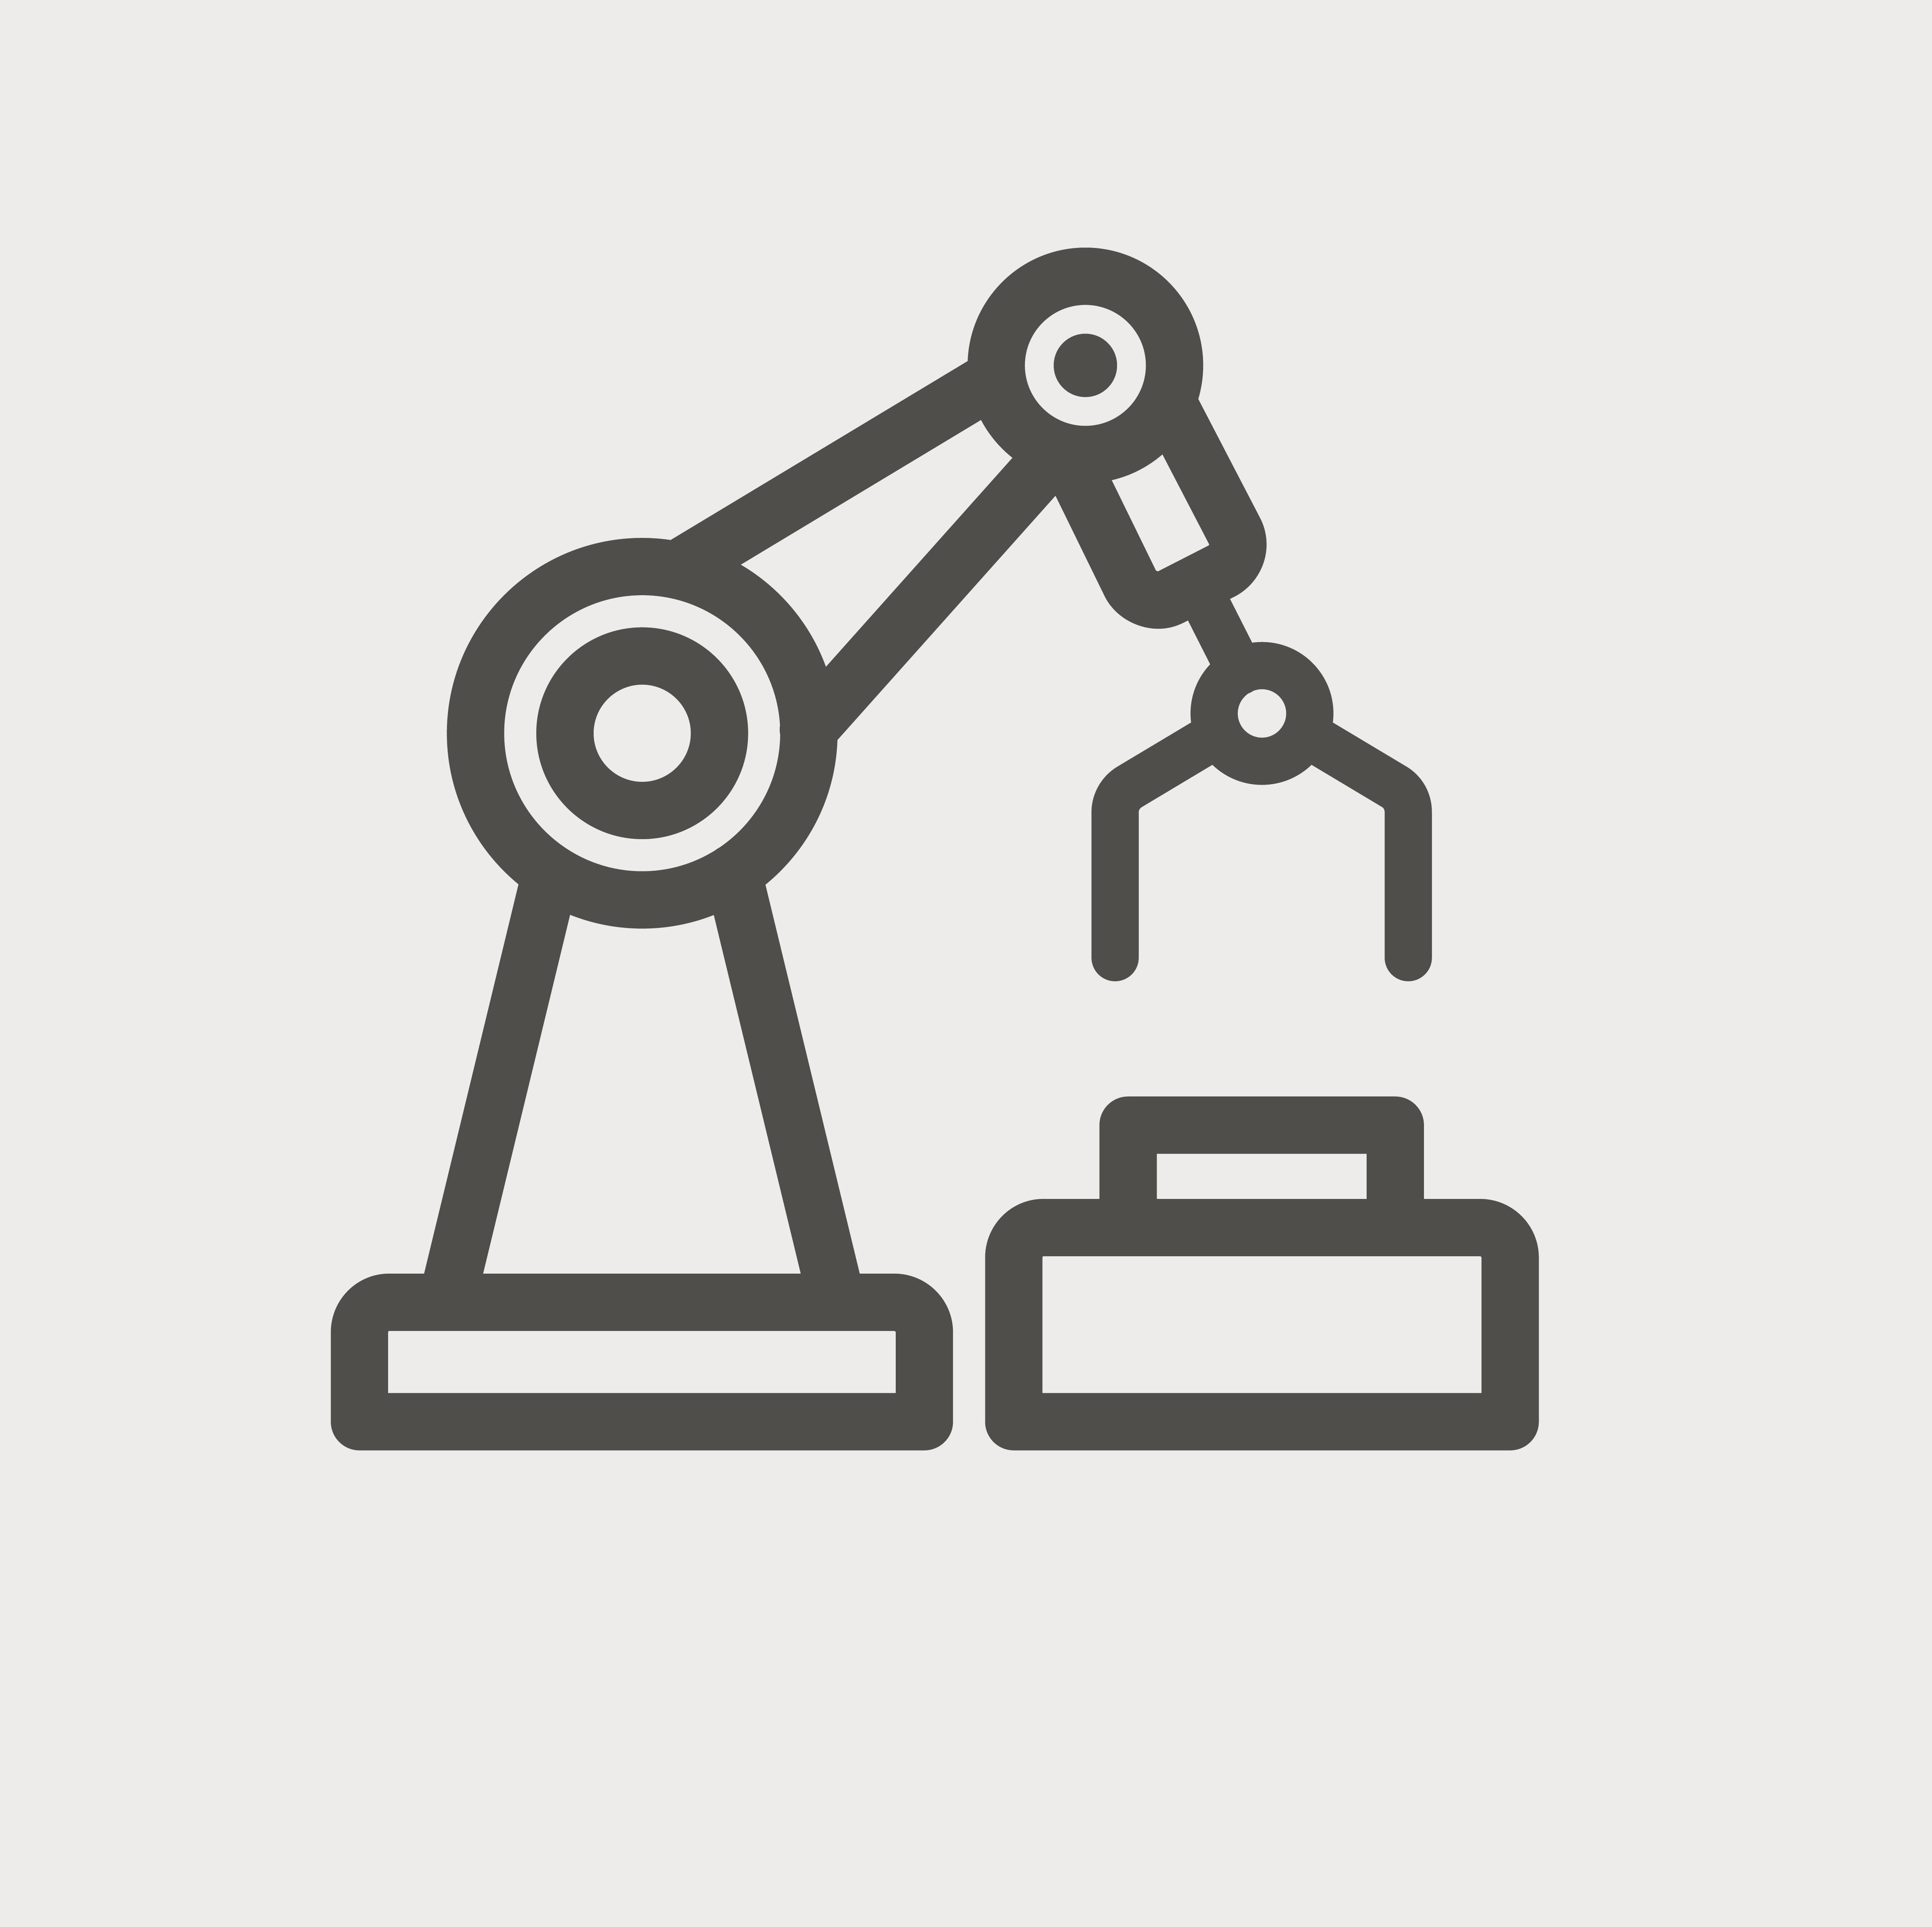 Elektro Pilger - Maschineninstallation